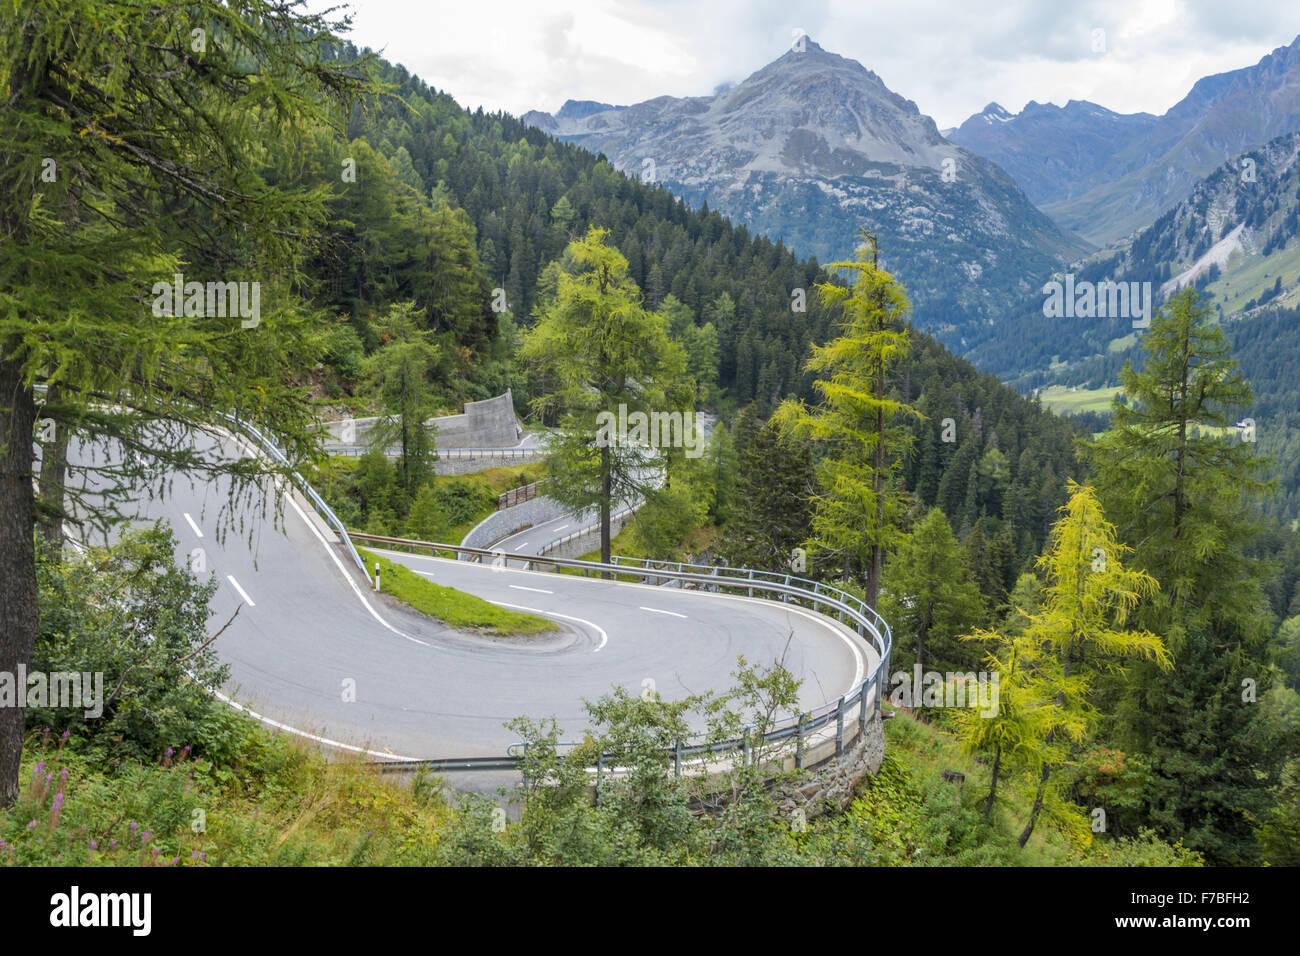 Majola Pass, el. 1.185 m, Swiss Alps, St. Moritz, Engadin, Graubuenden, Switzerland, Grisons - Stock Image